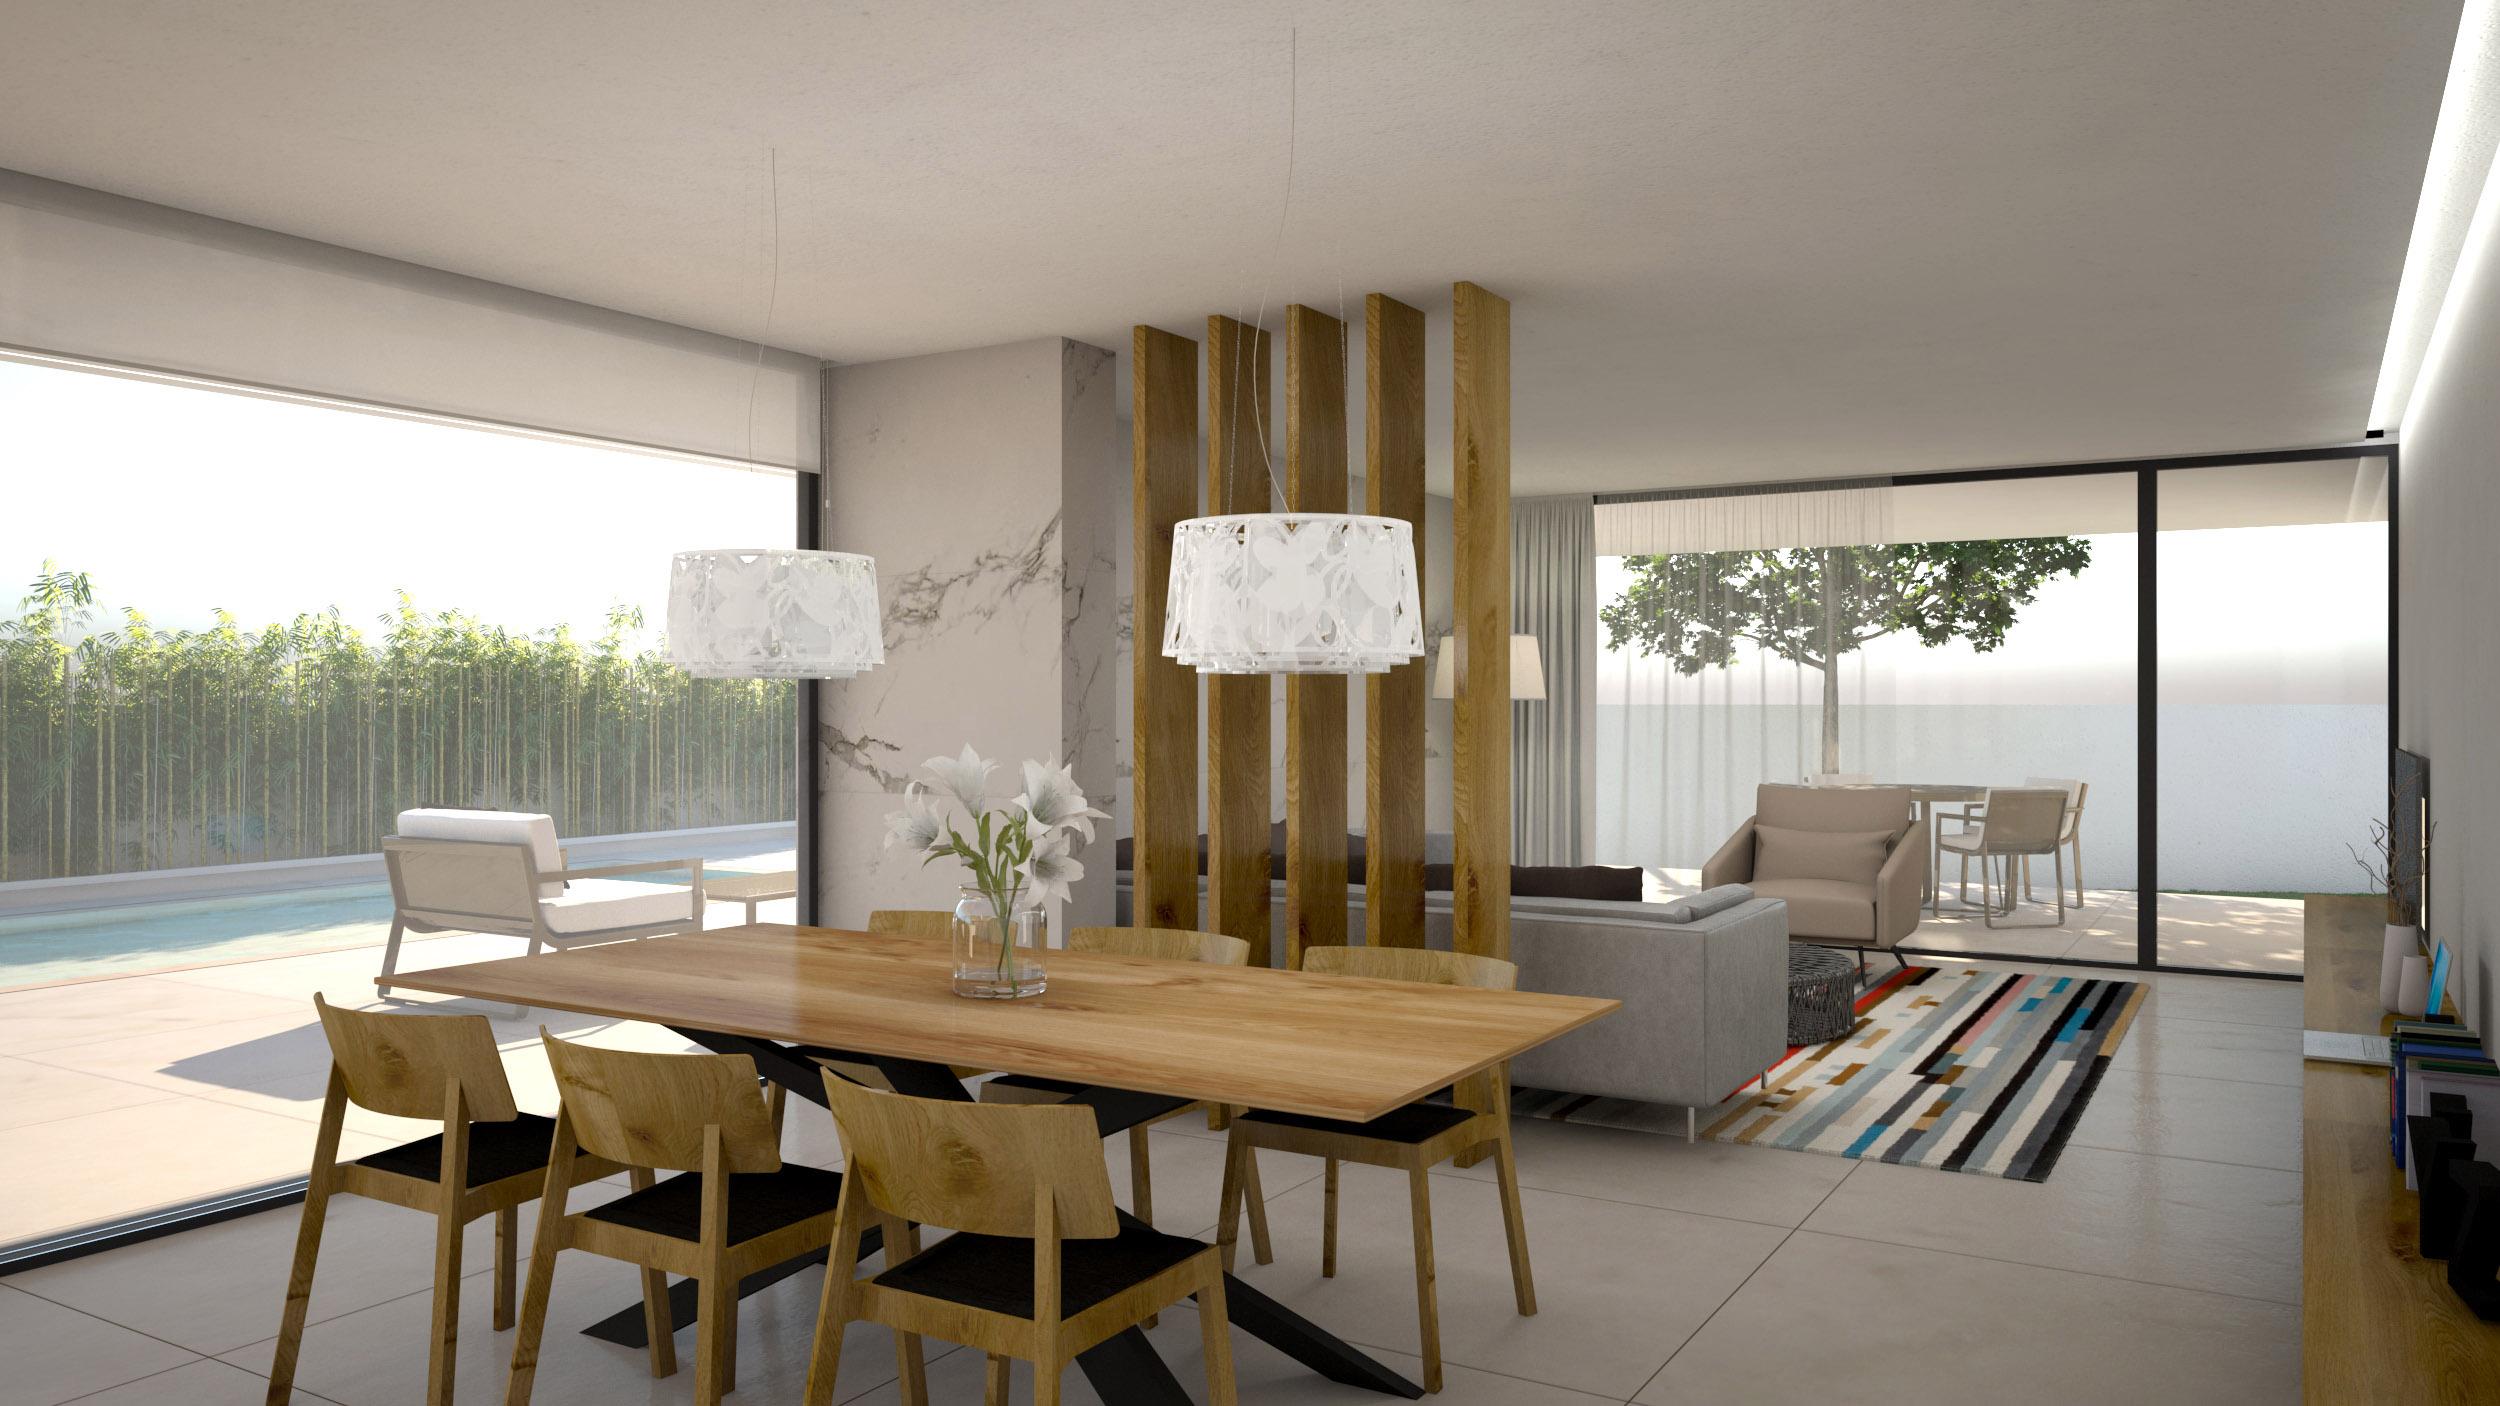 Chiralt arquitectos valenciaponce chiralt arquitectos for Arquitectos valencia